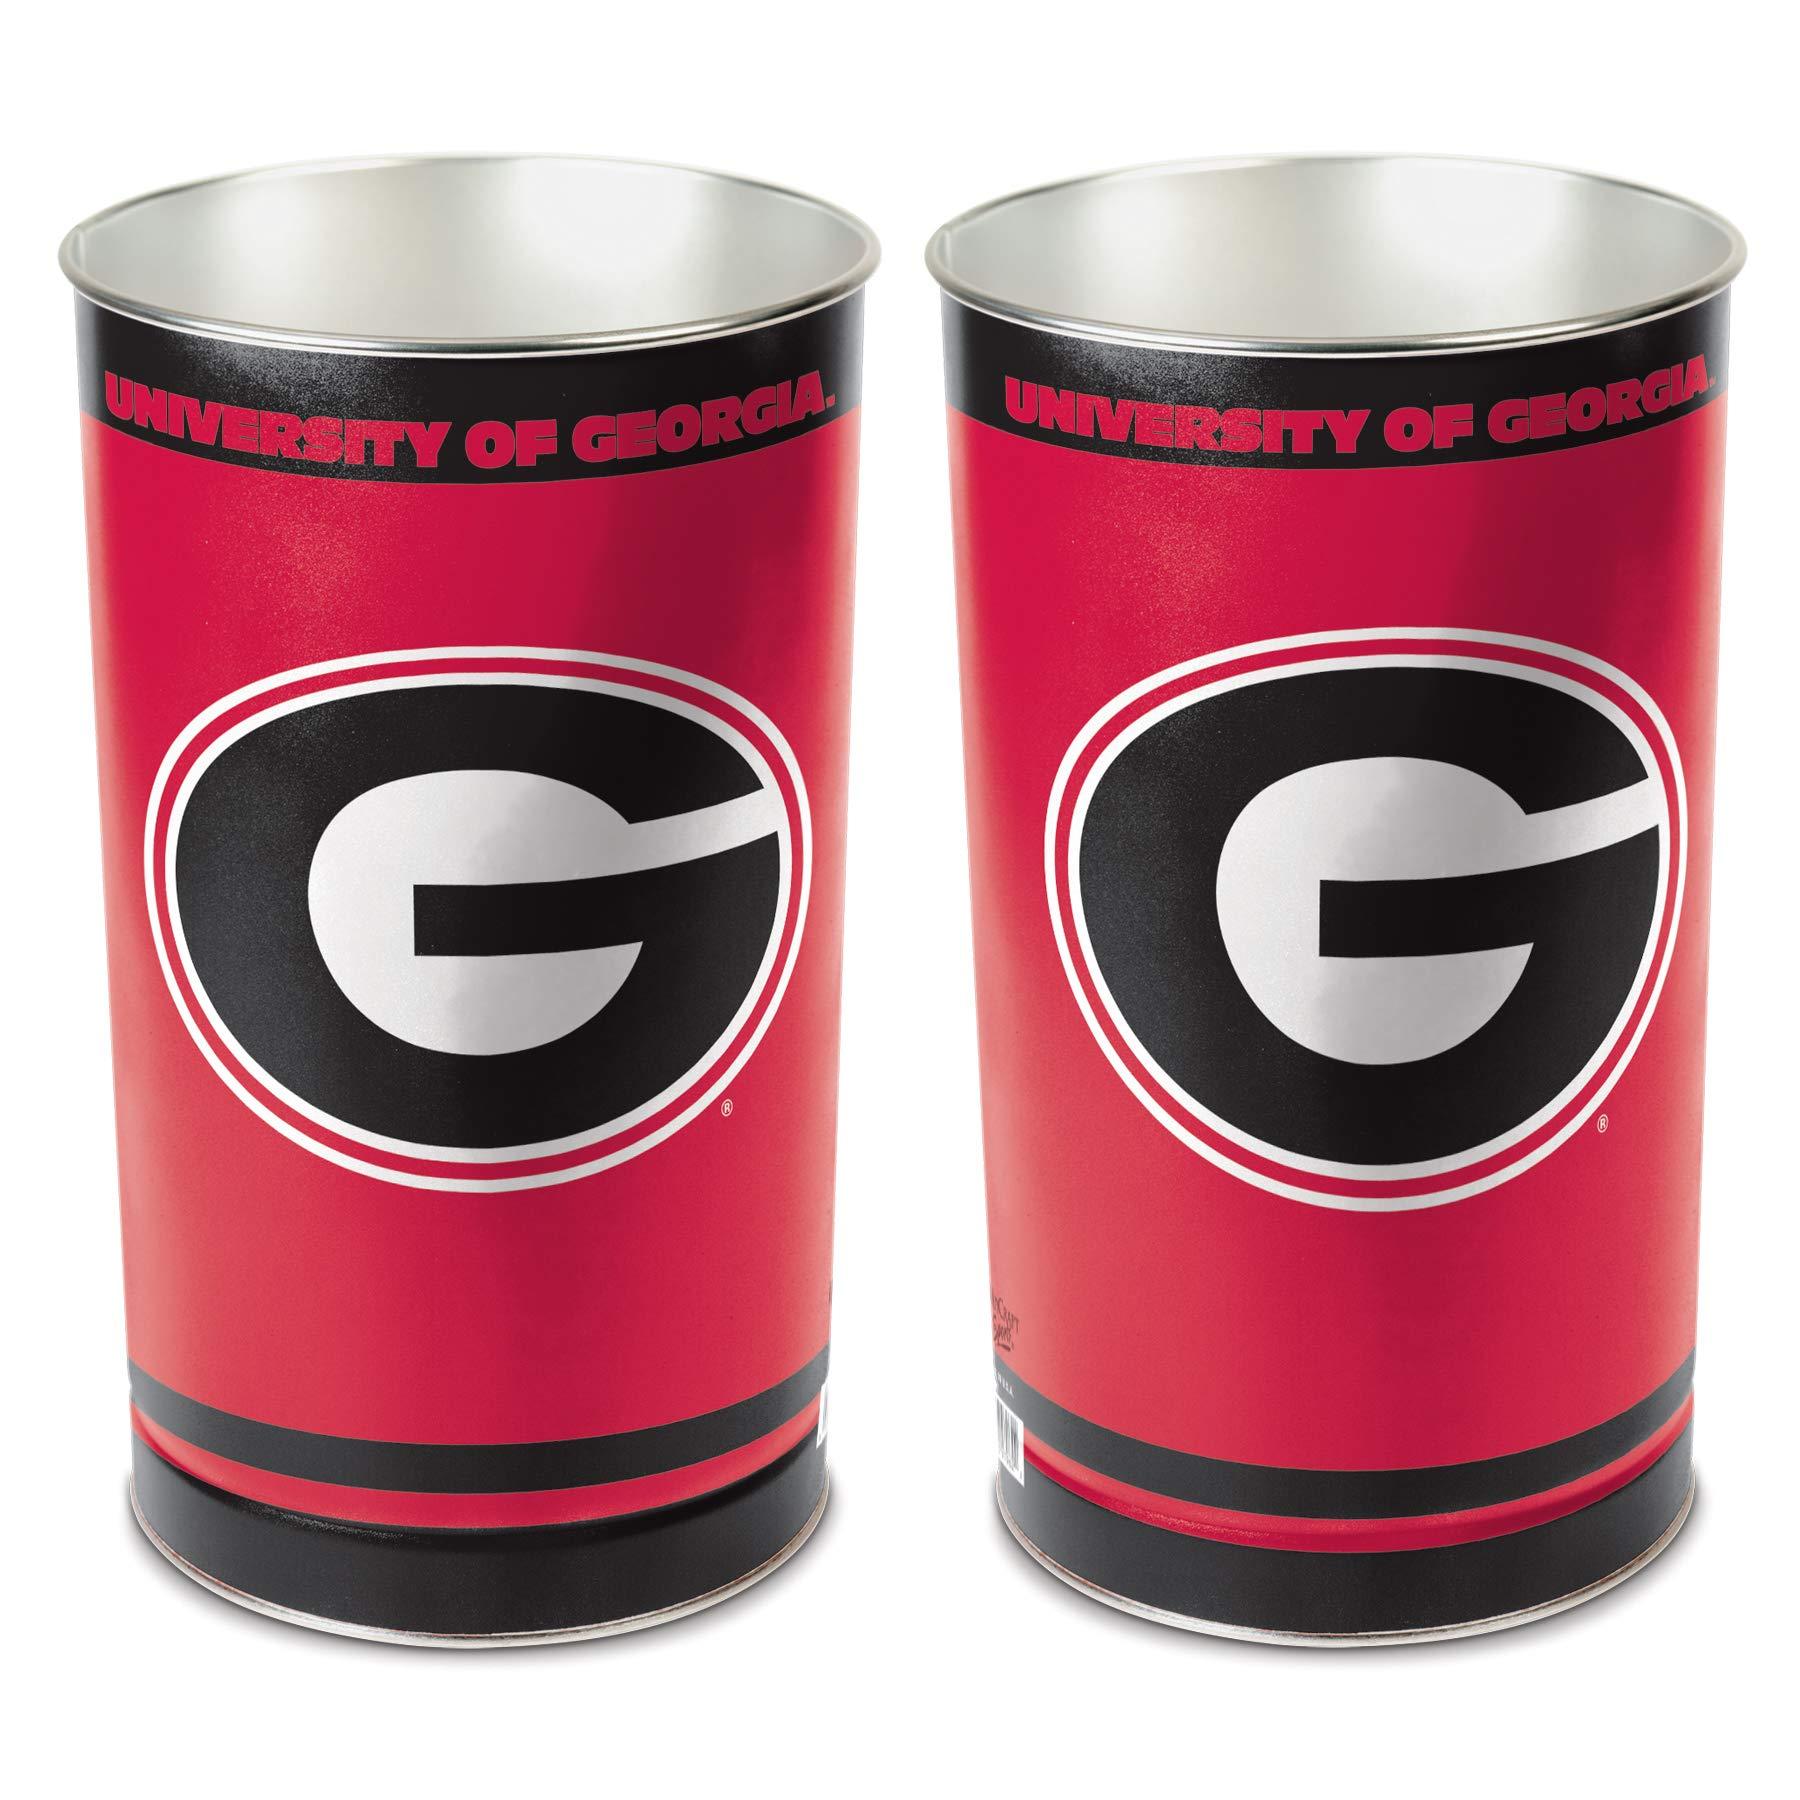 WinCraft NCAA 9796211 University of Georgia Tapered Wastebasket, 15'' H